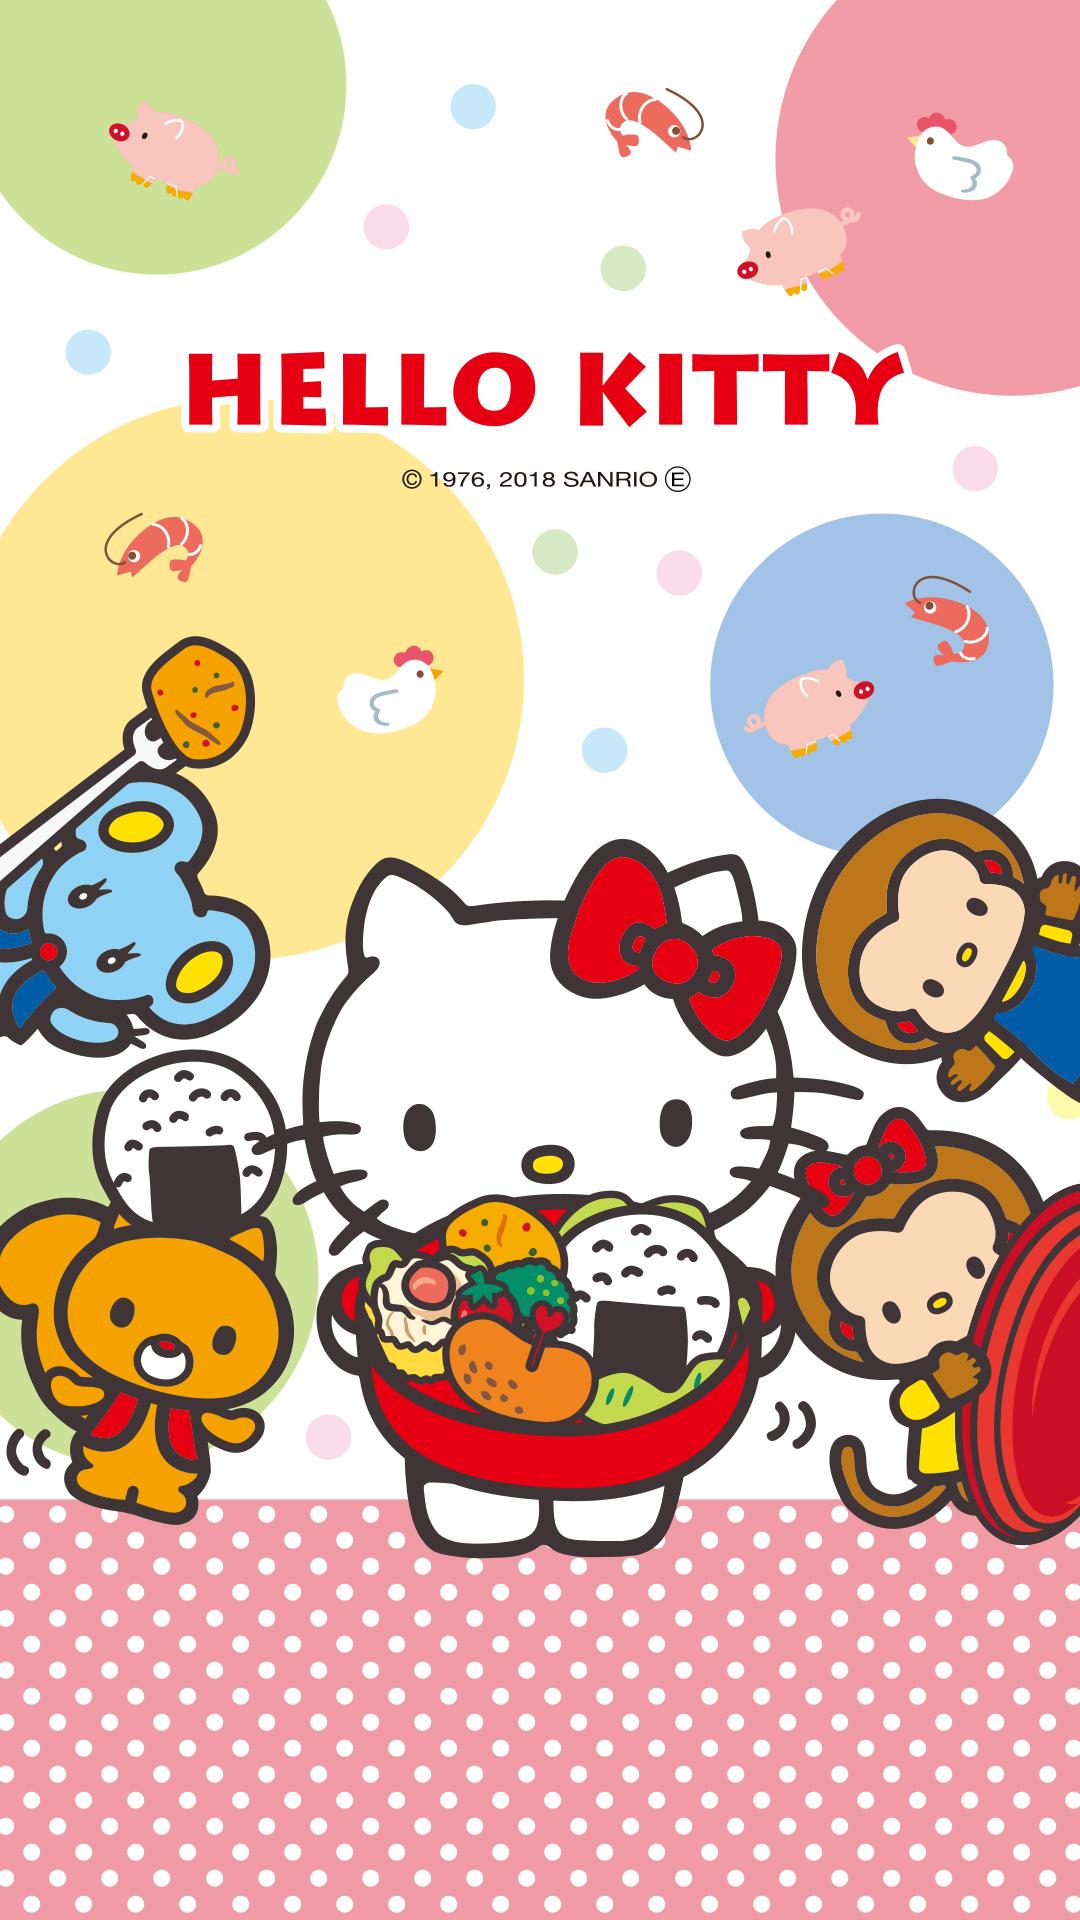 Hello Kitty オリジナルフォトフレームで写真を作ろう Kawaii お